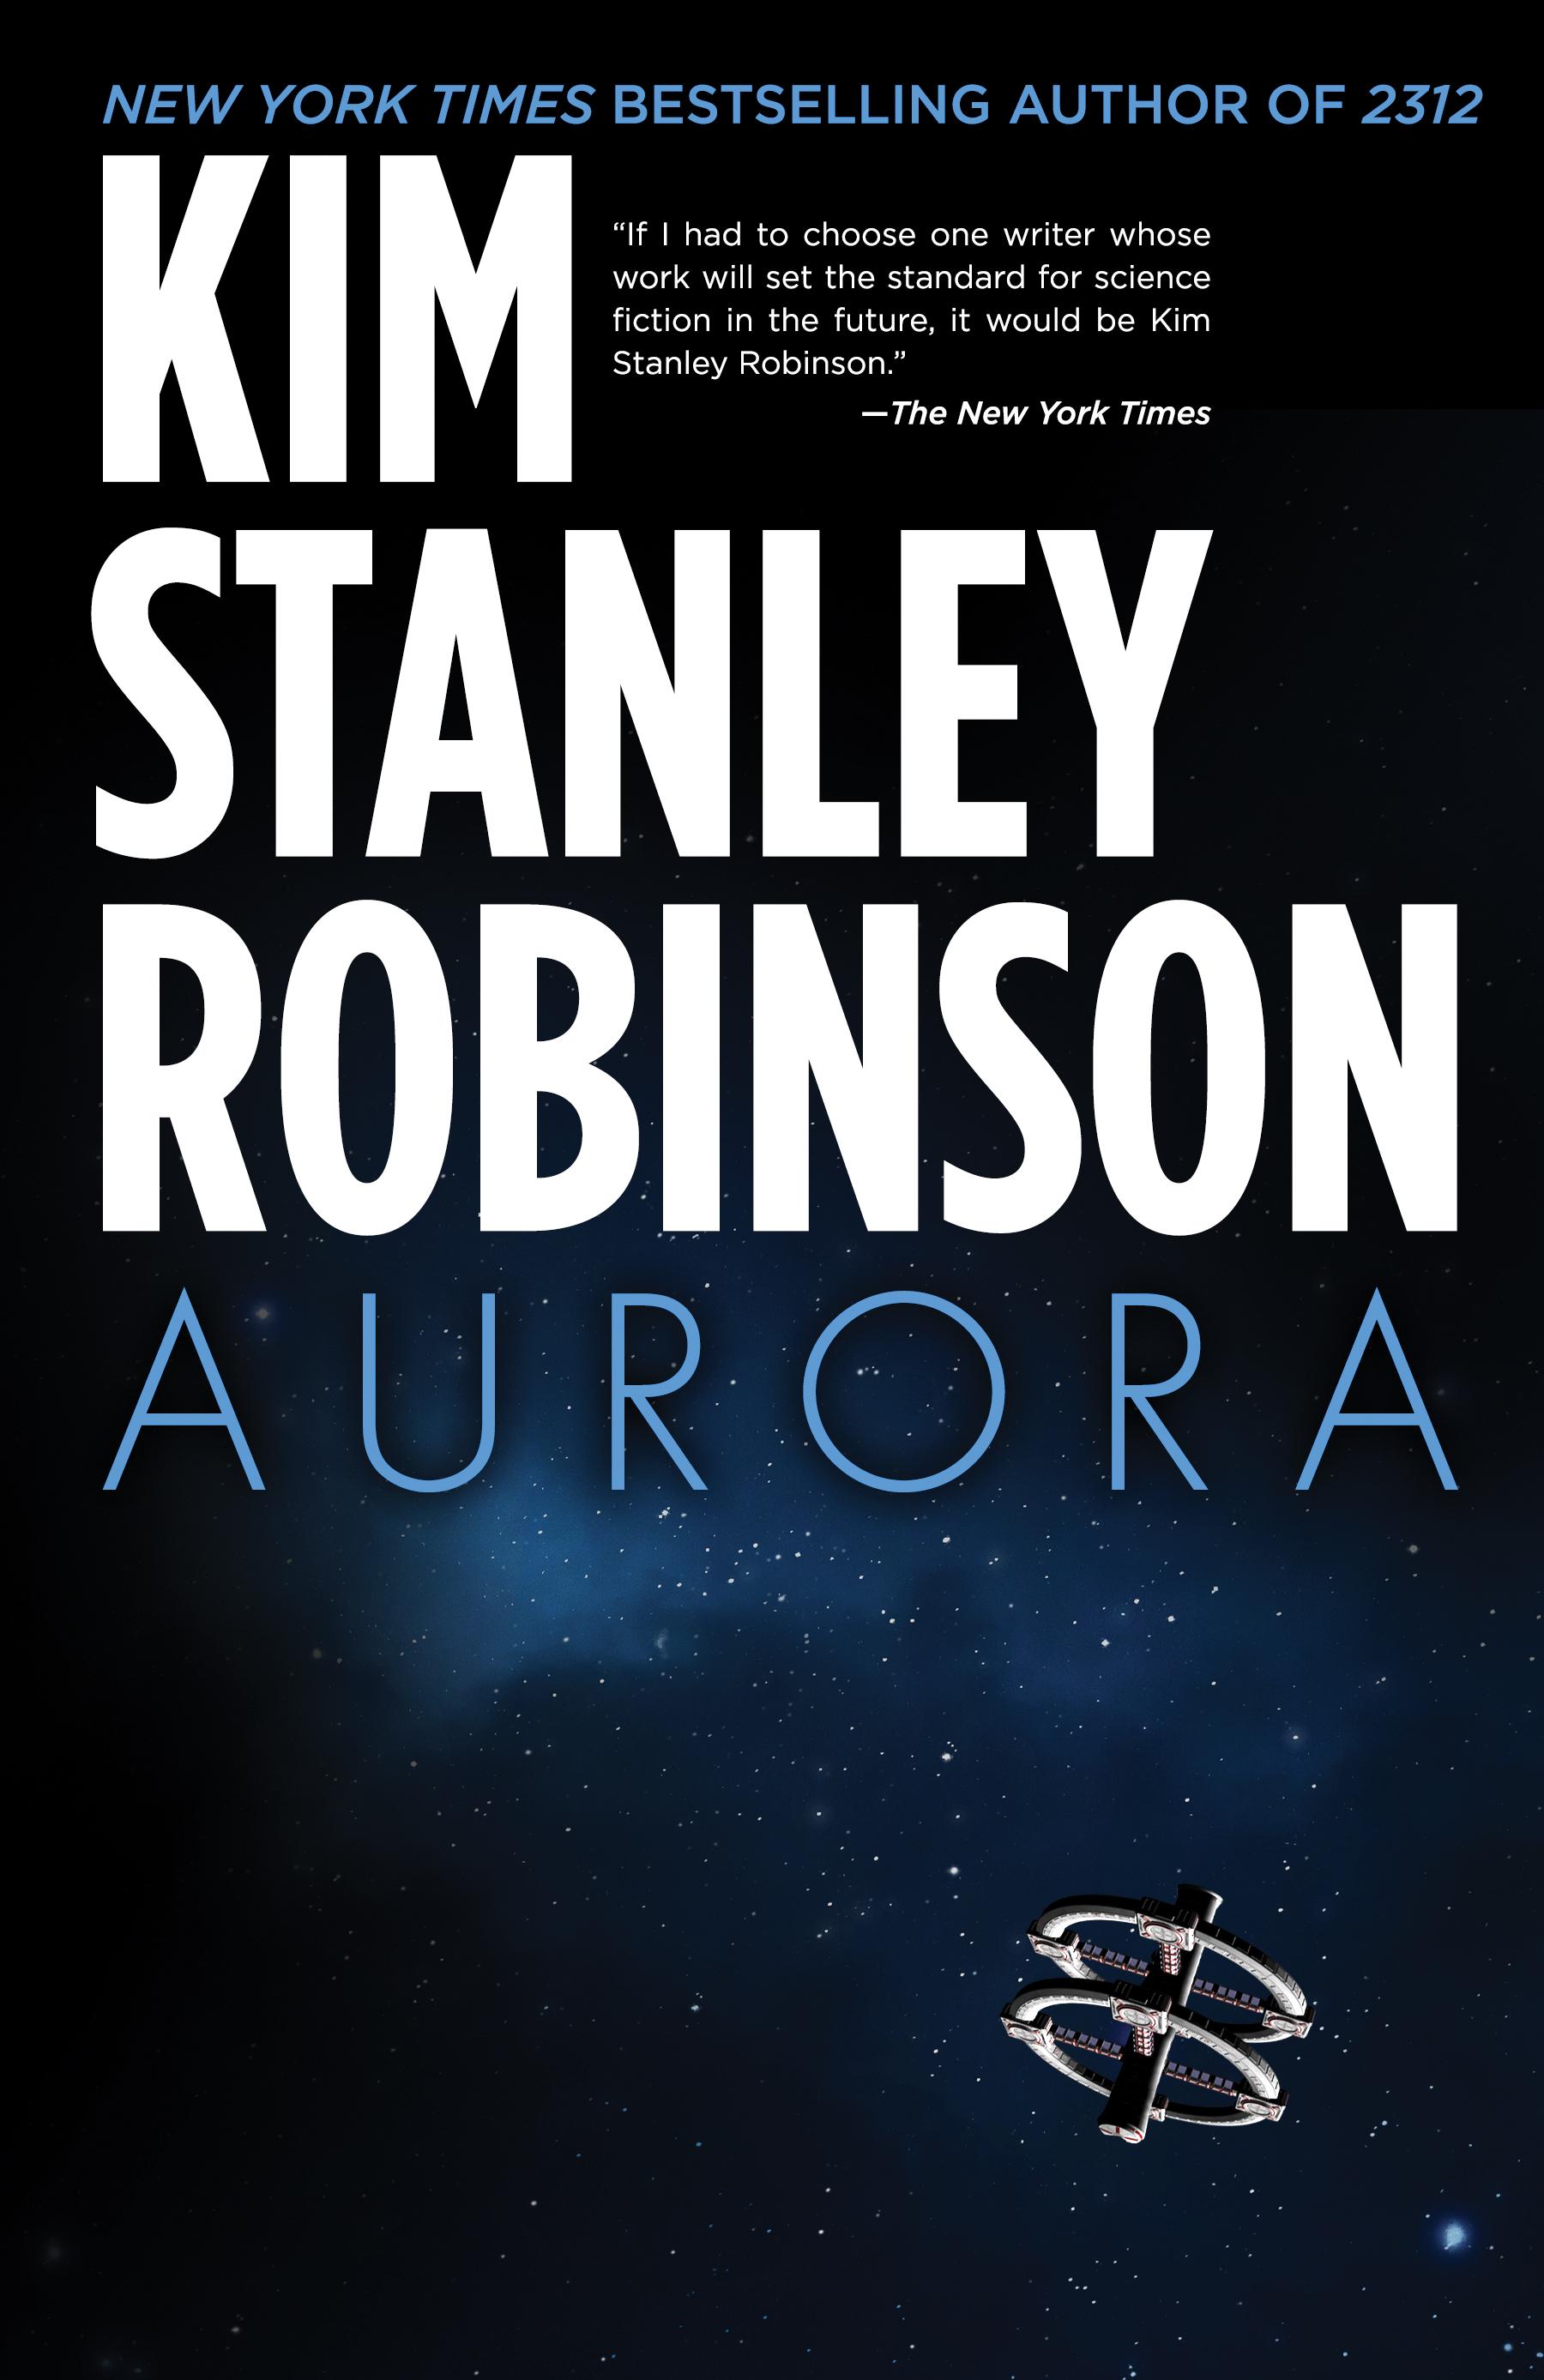 AURORA by Kim Stanley Robinson